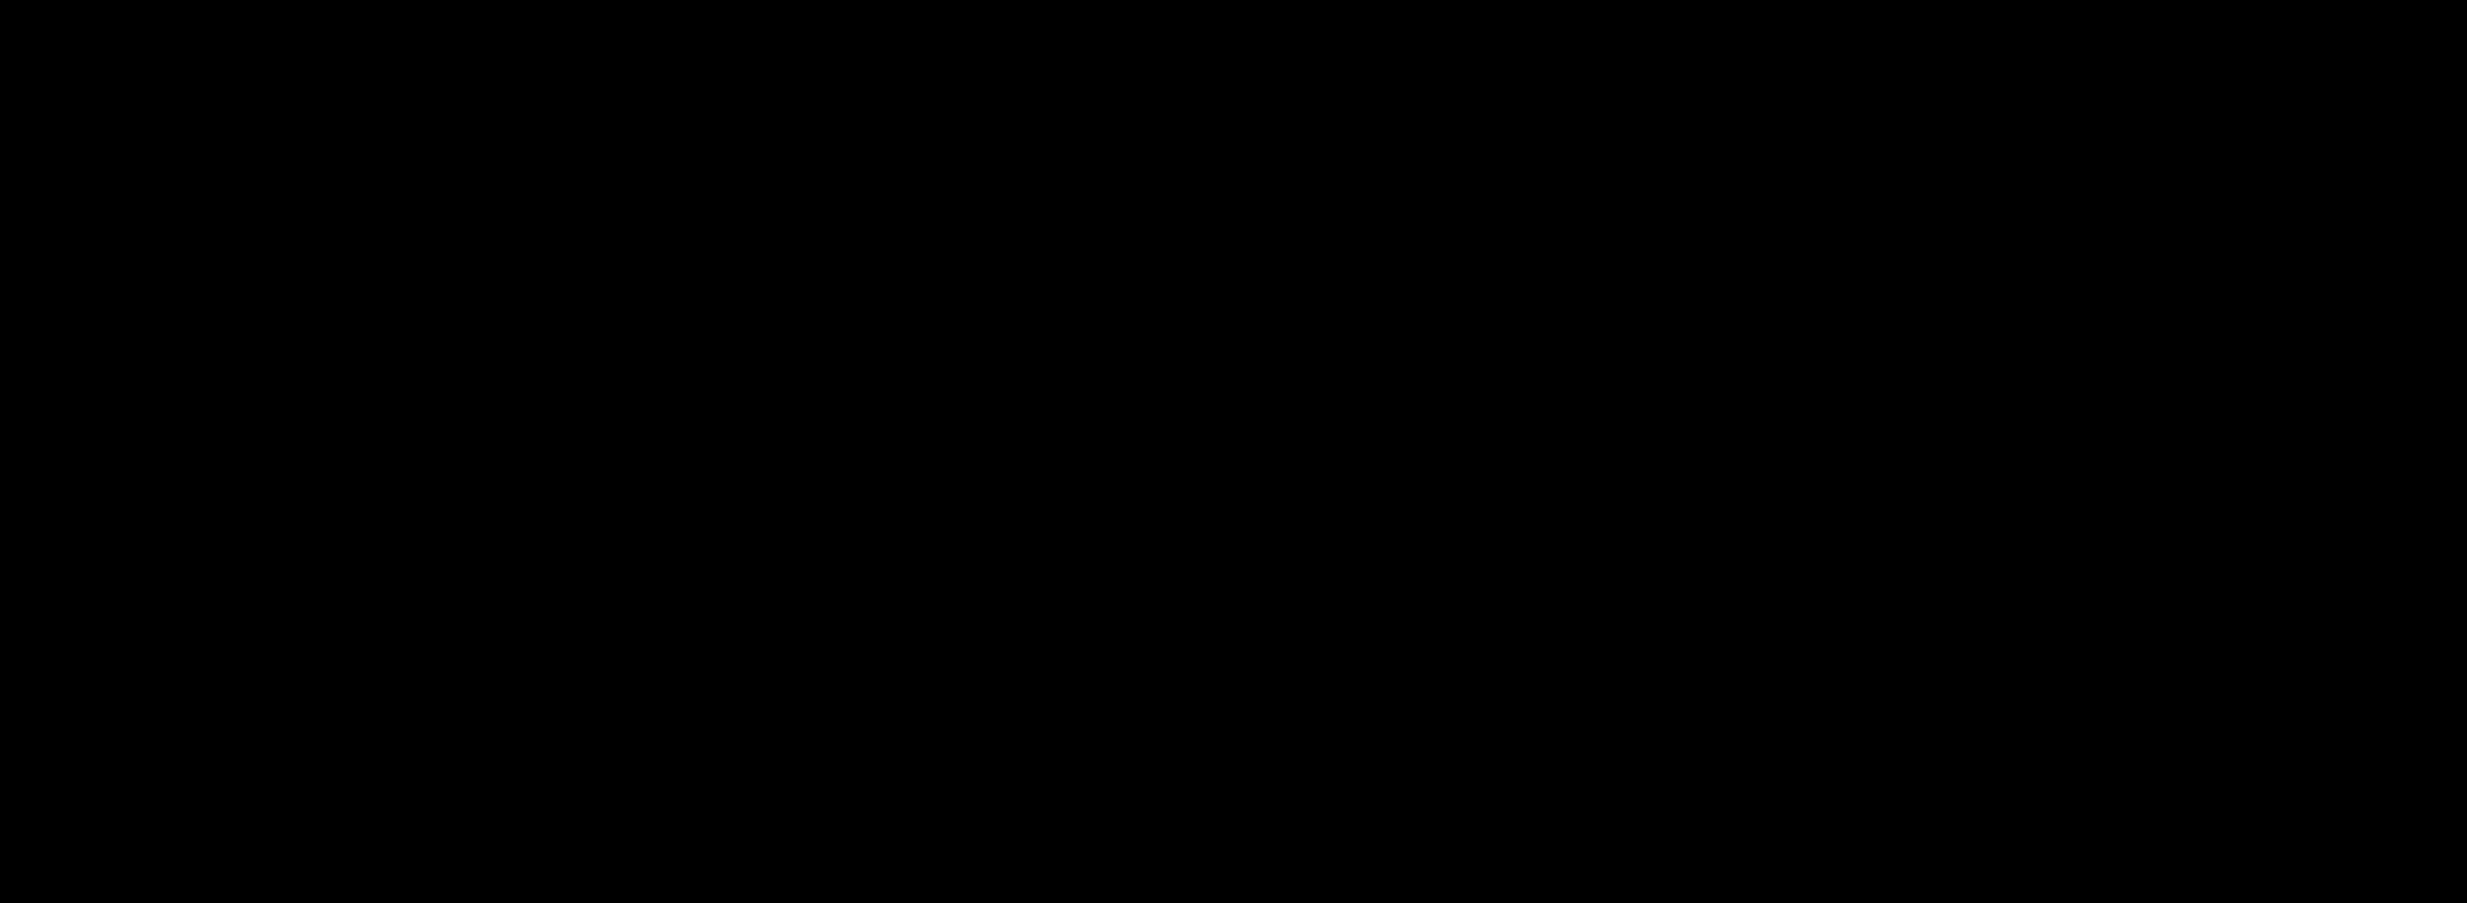 4tiitoo GmbH